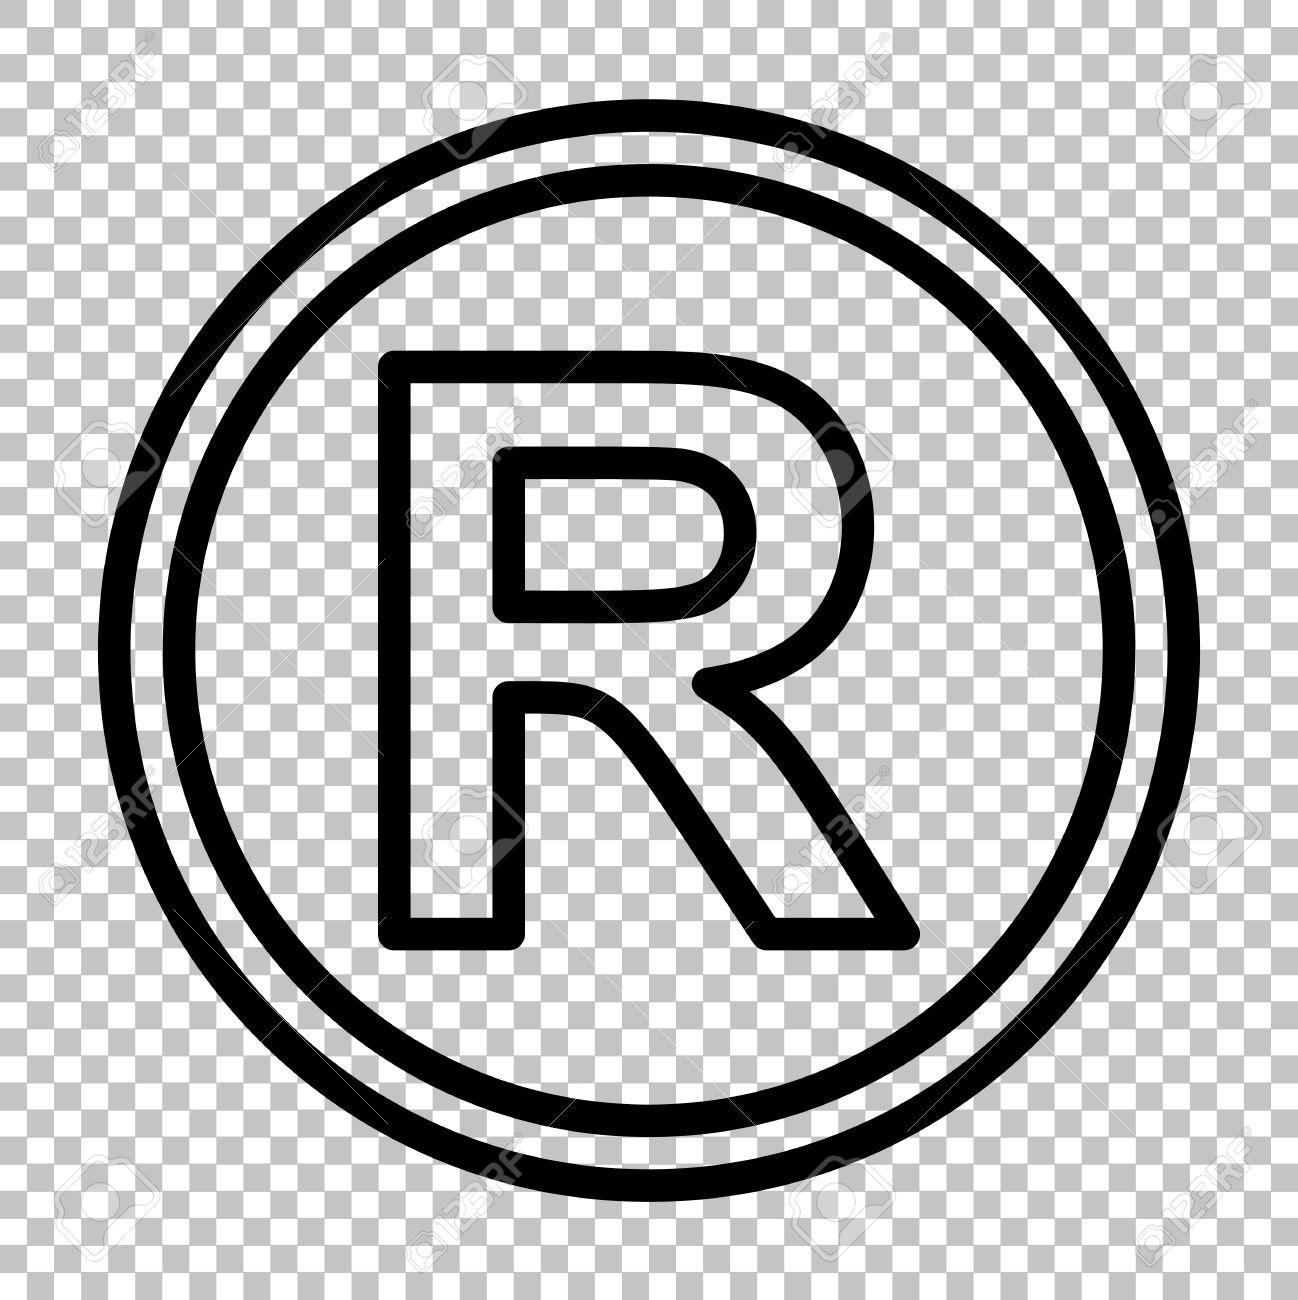 registered trademark sign line icon on transparent background